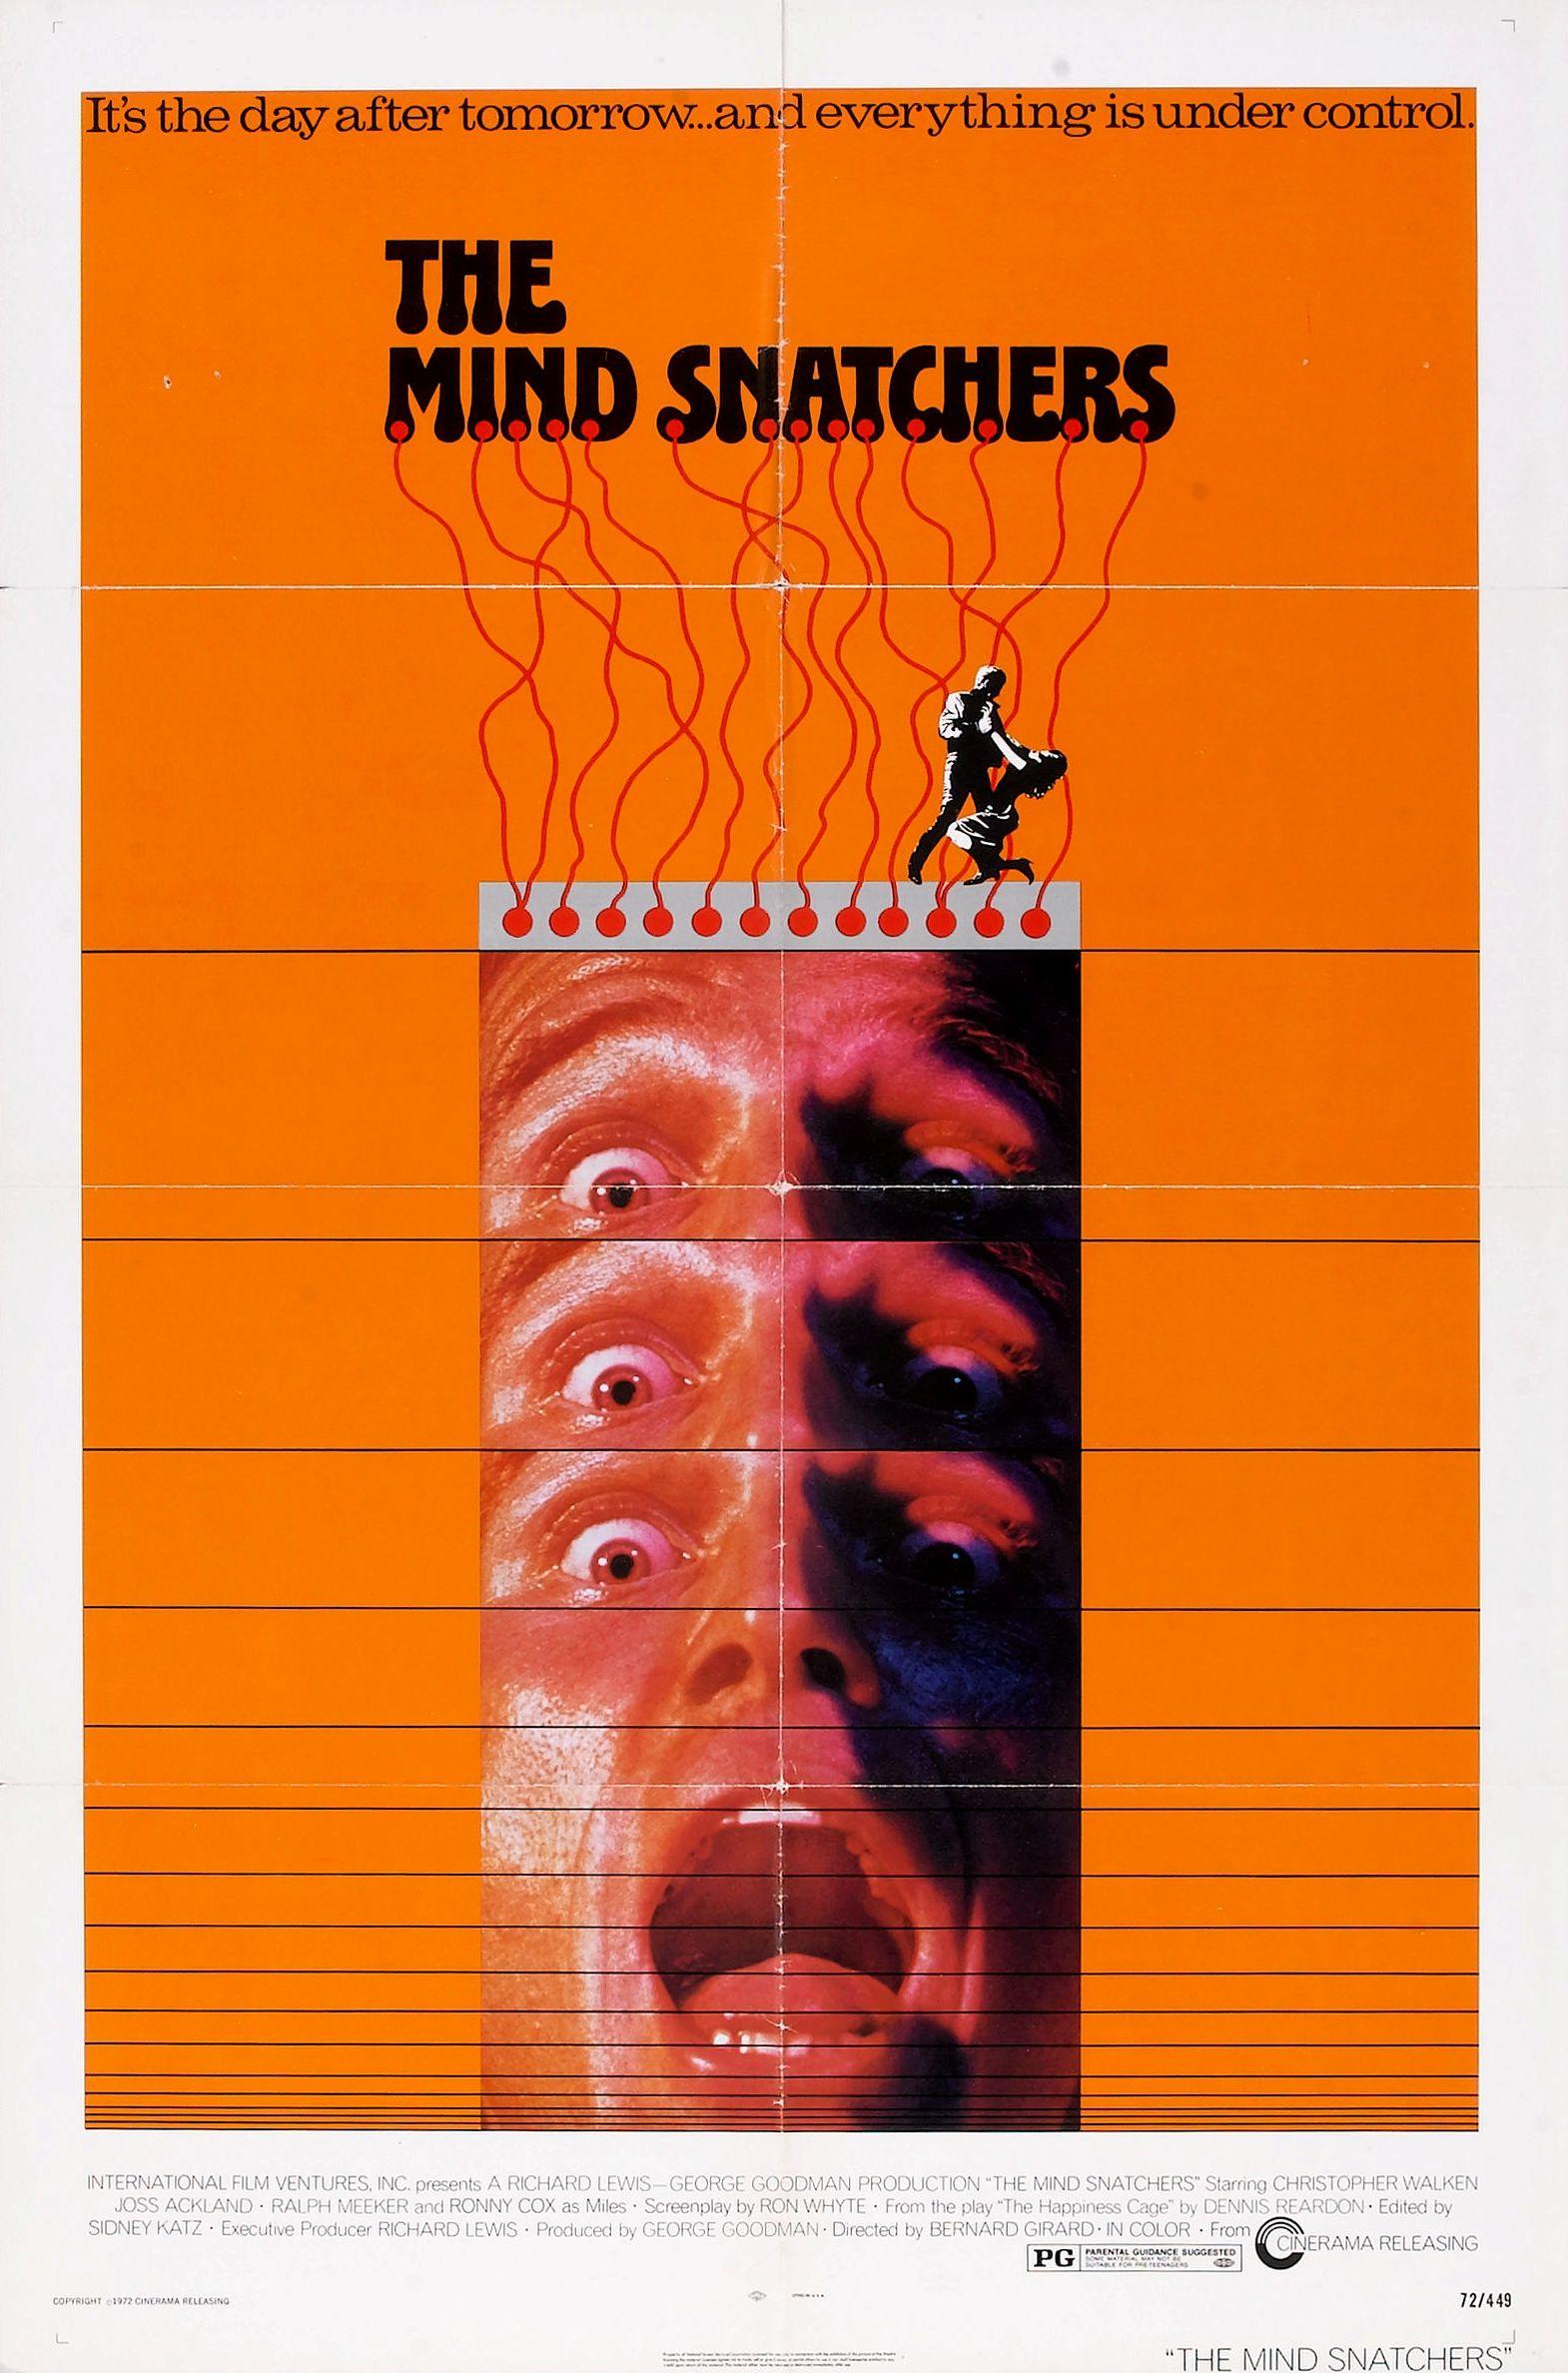 Letzter Film + Bewertung - The Mind Snatchers - Allmystery